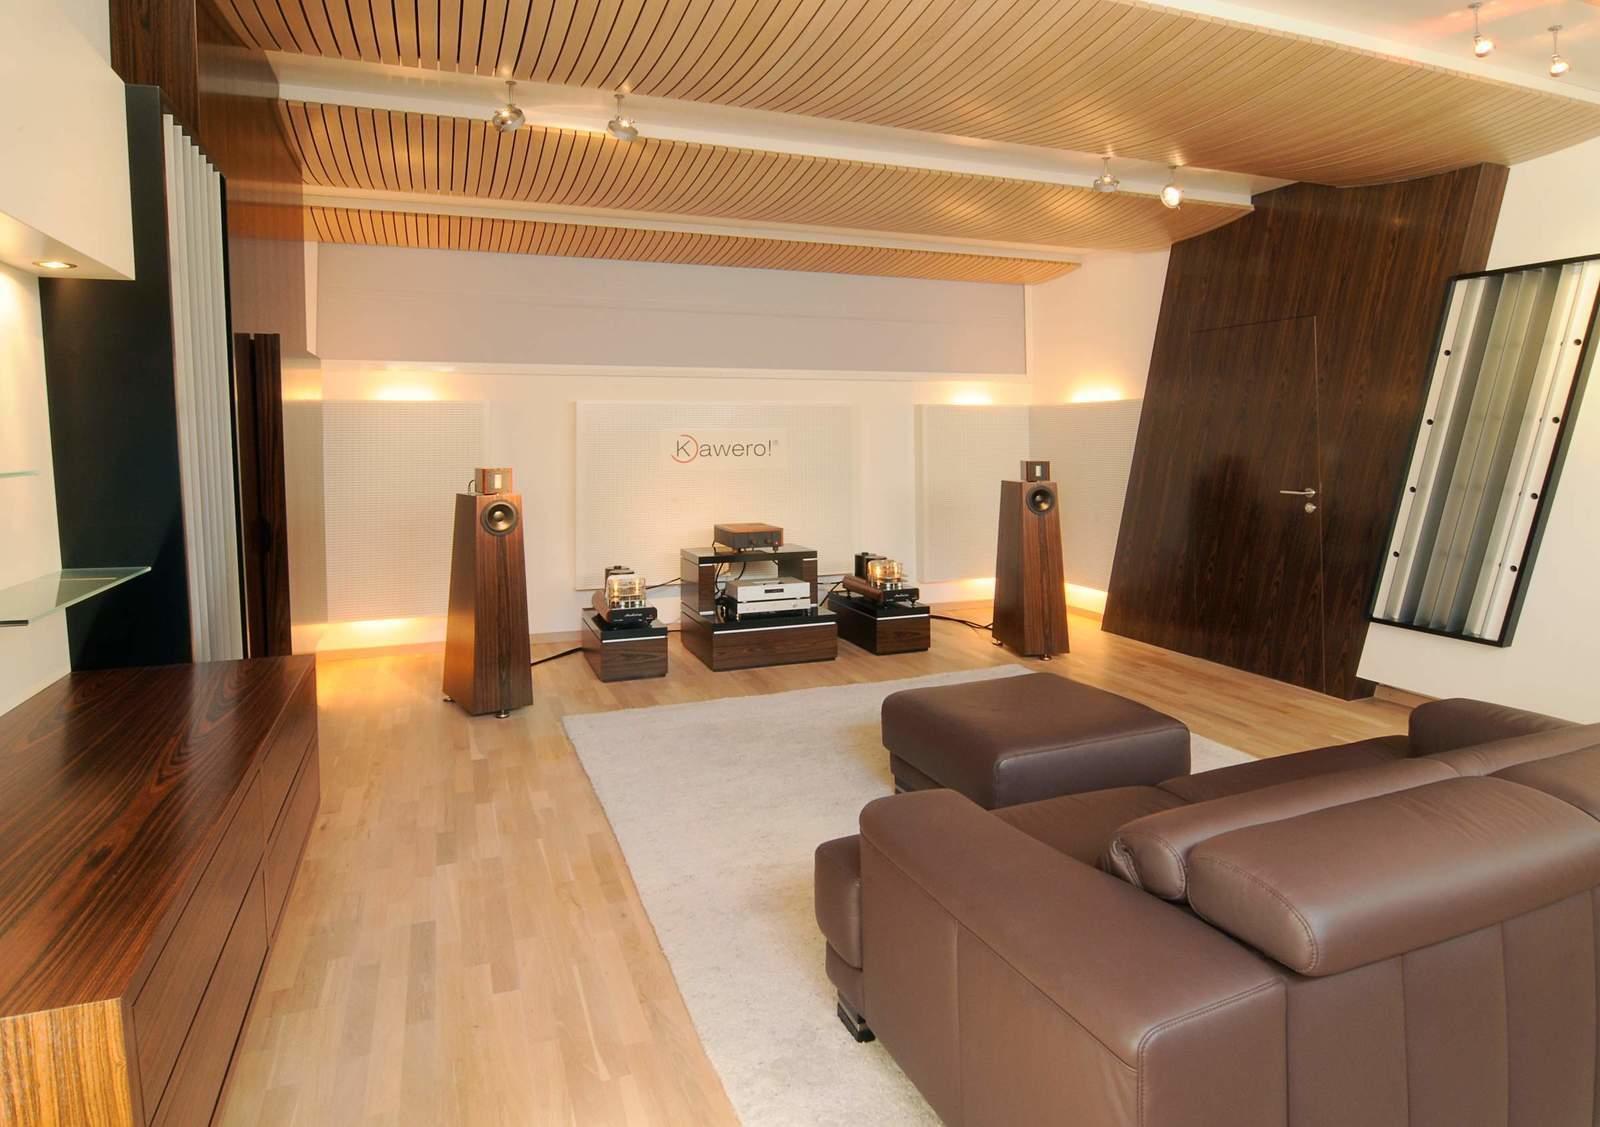 Listening Rooms Room Treatment Kaiser Acoustics Germany